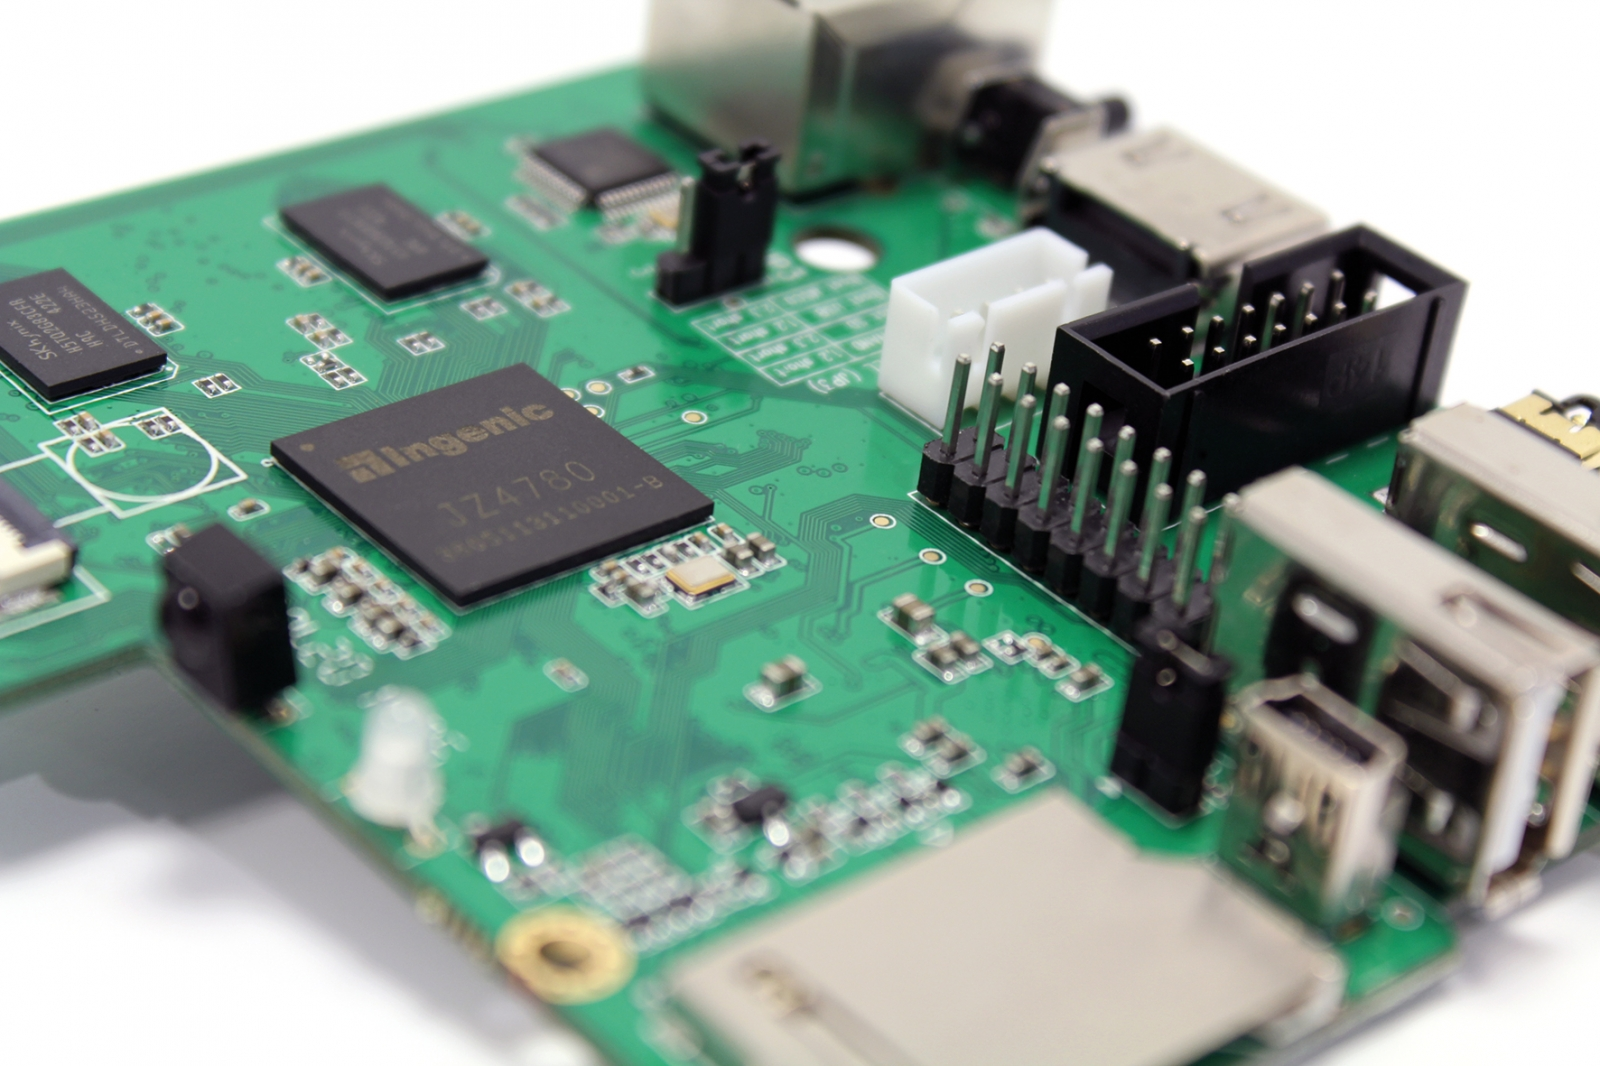 Creator CI20 is Raspberry Pi on Steroids